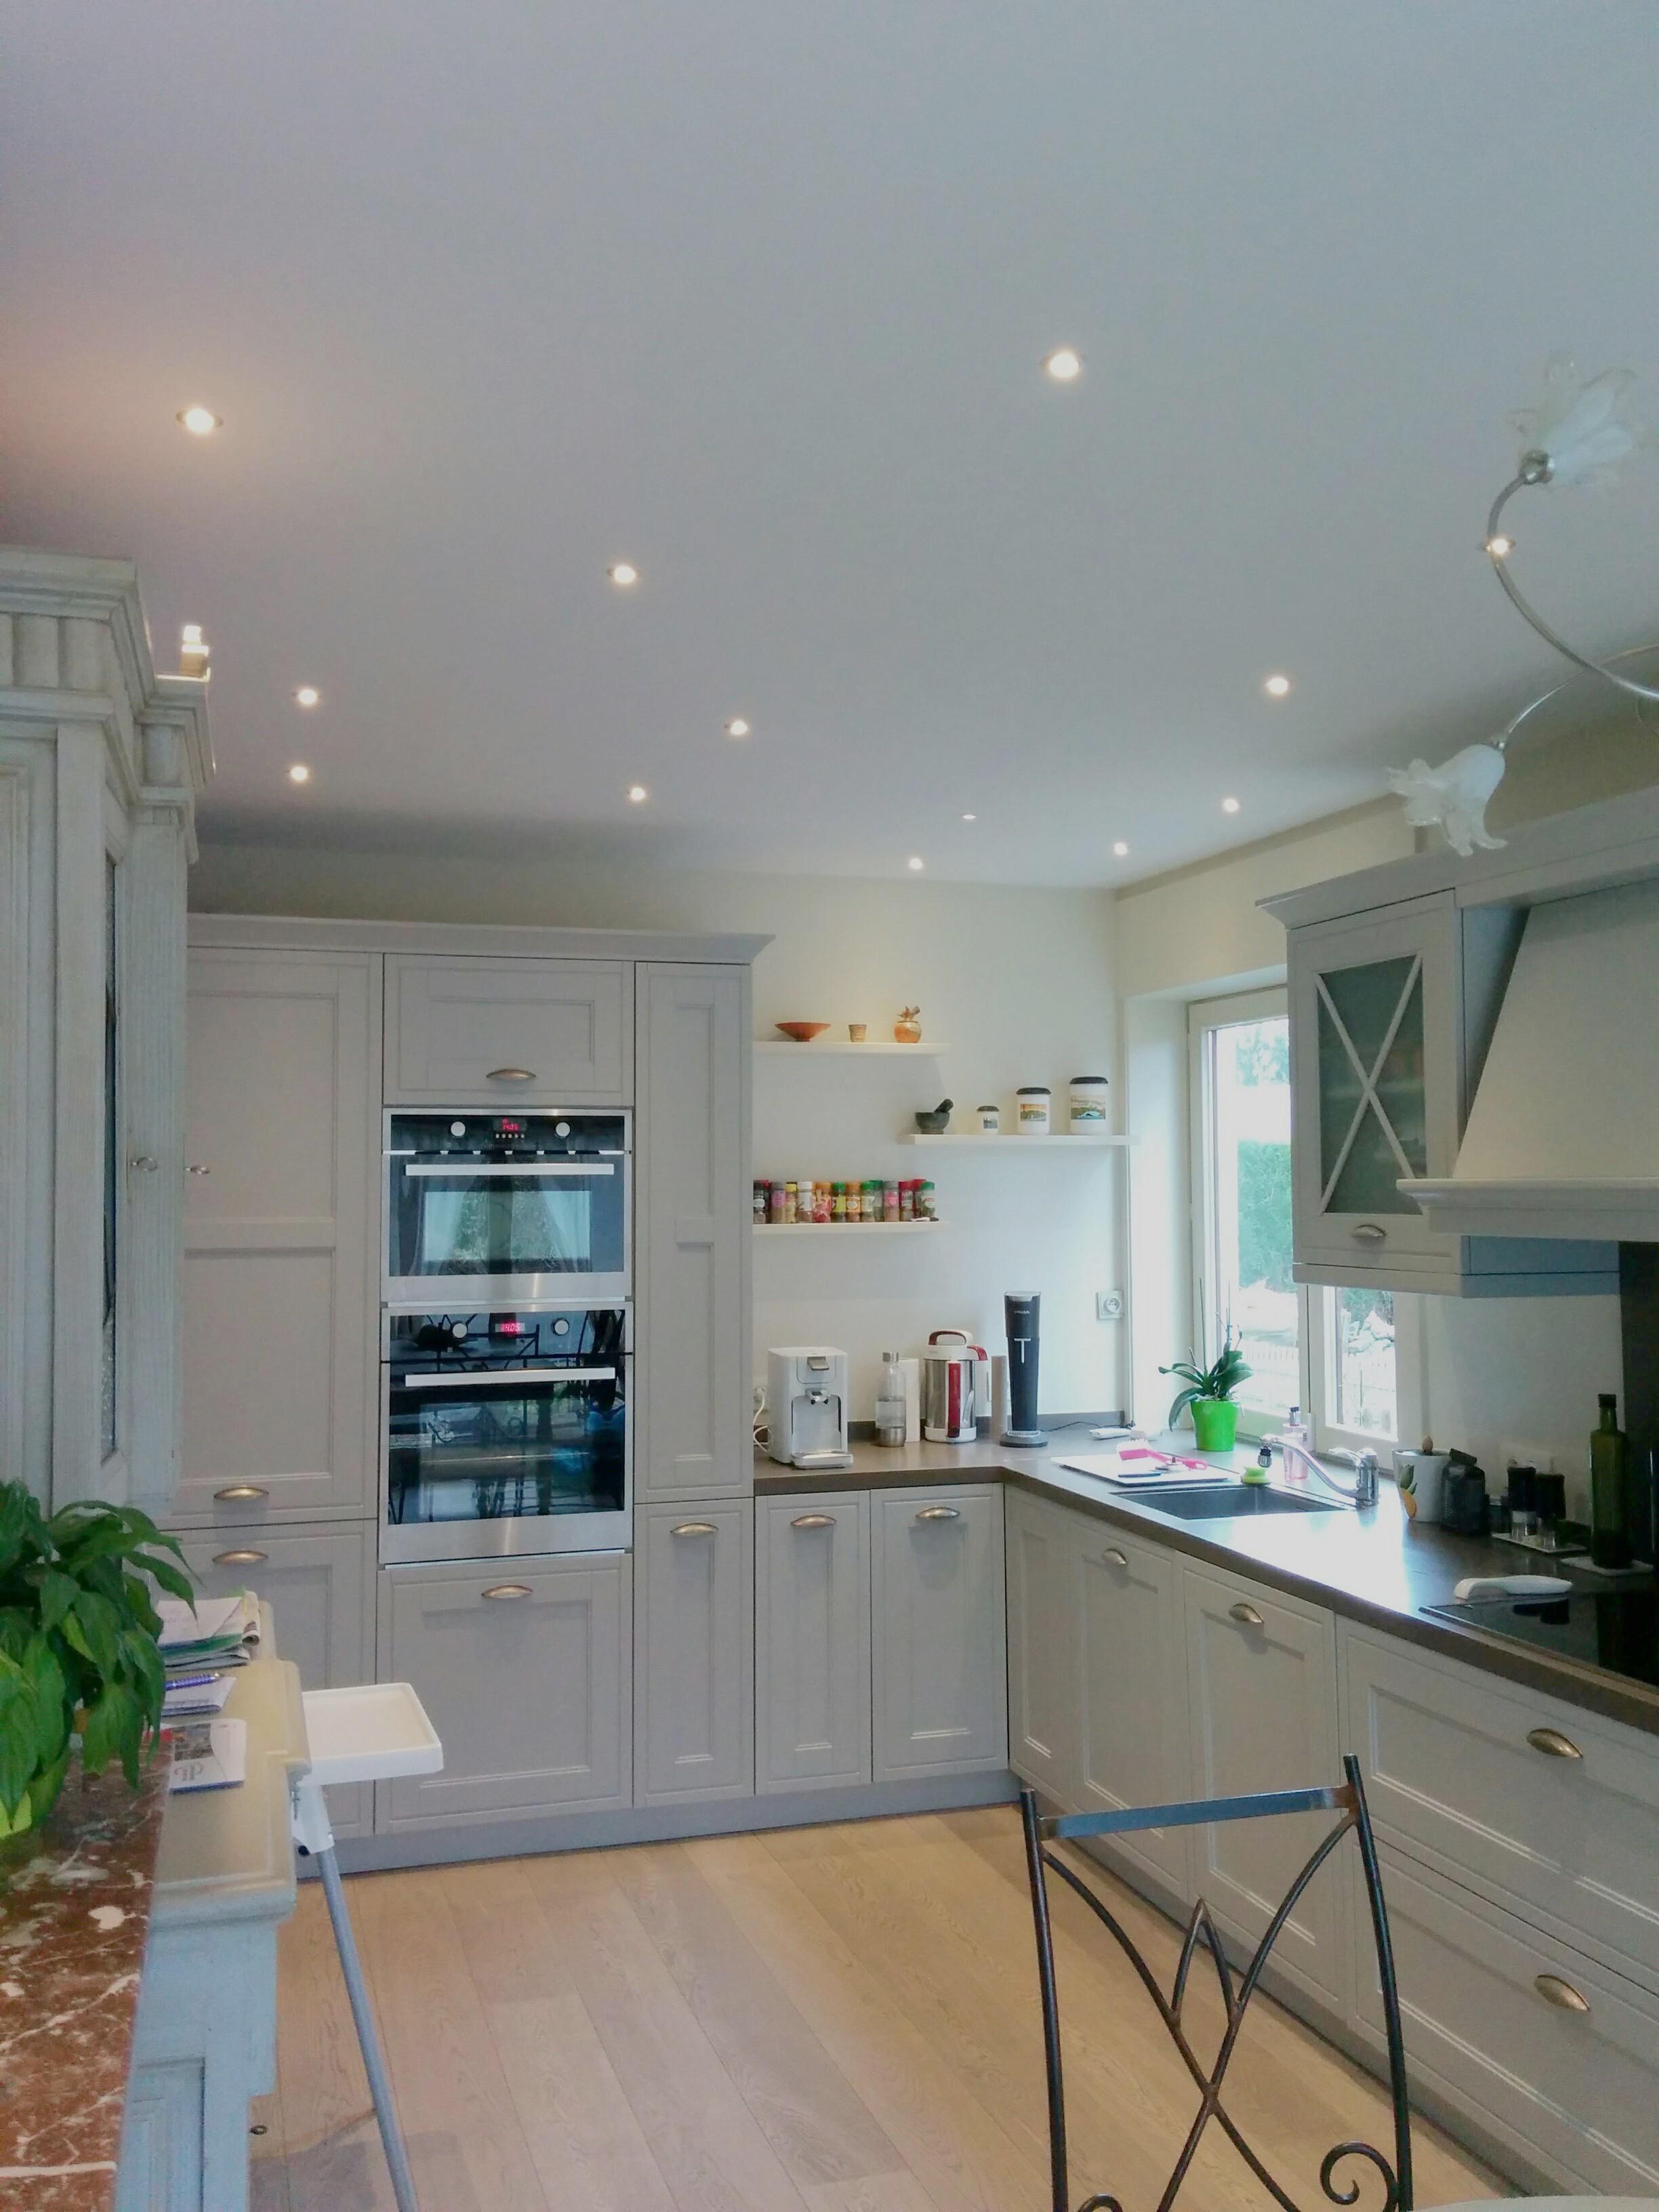 Mini spots plafond cuisine - LED\'s Go